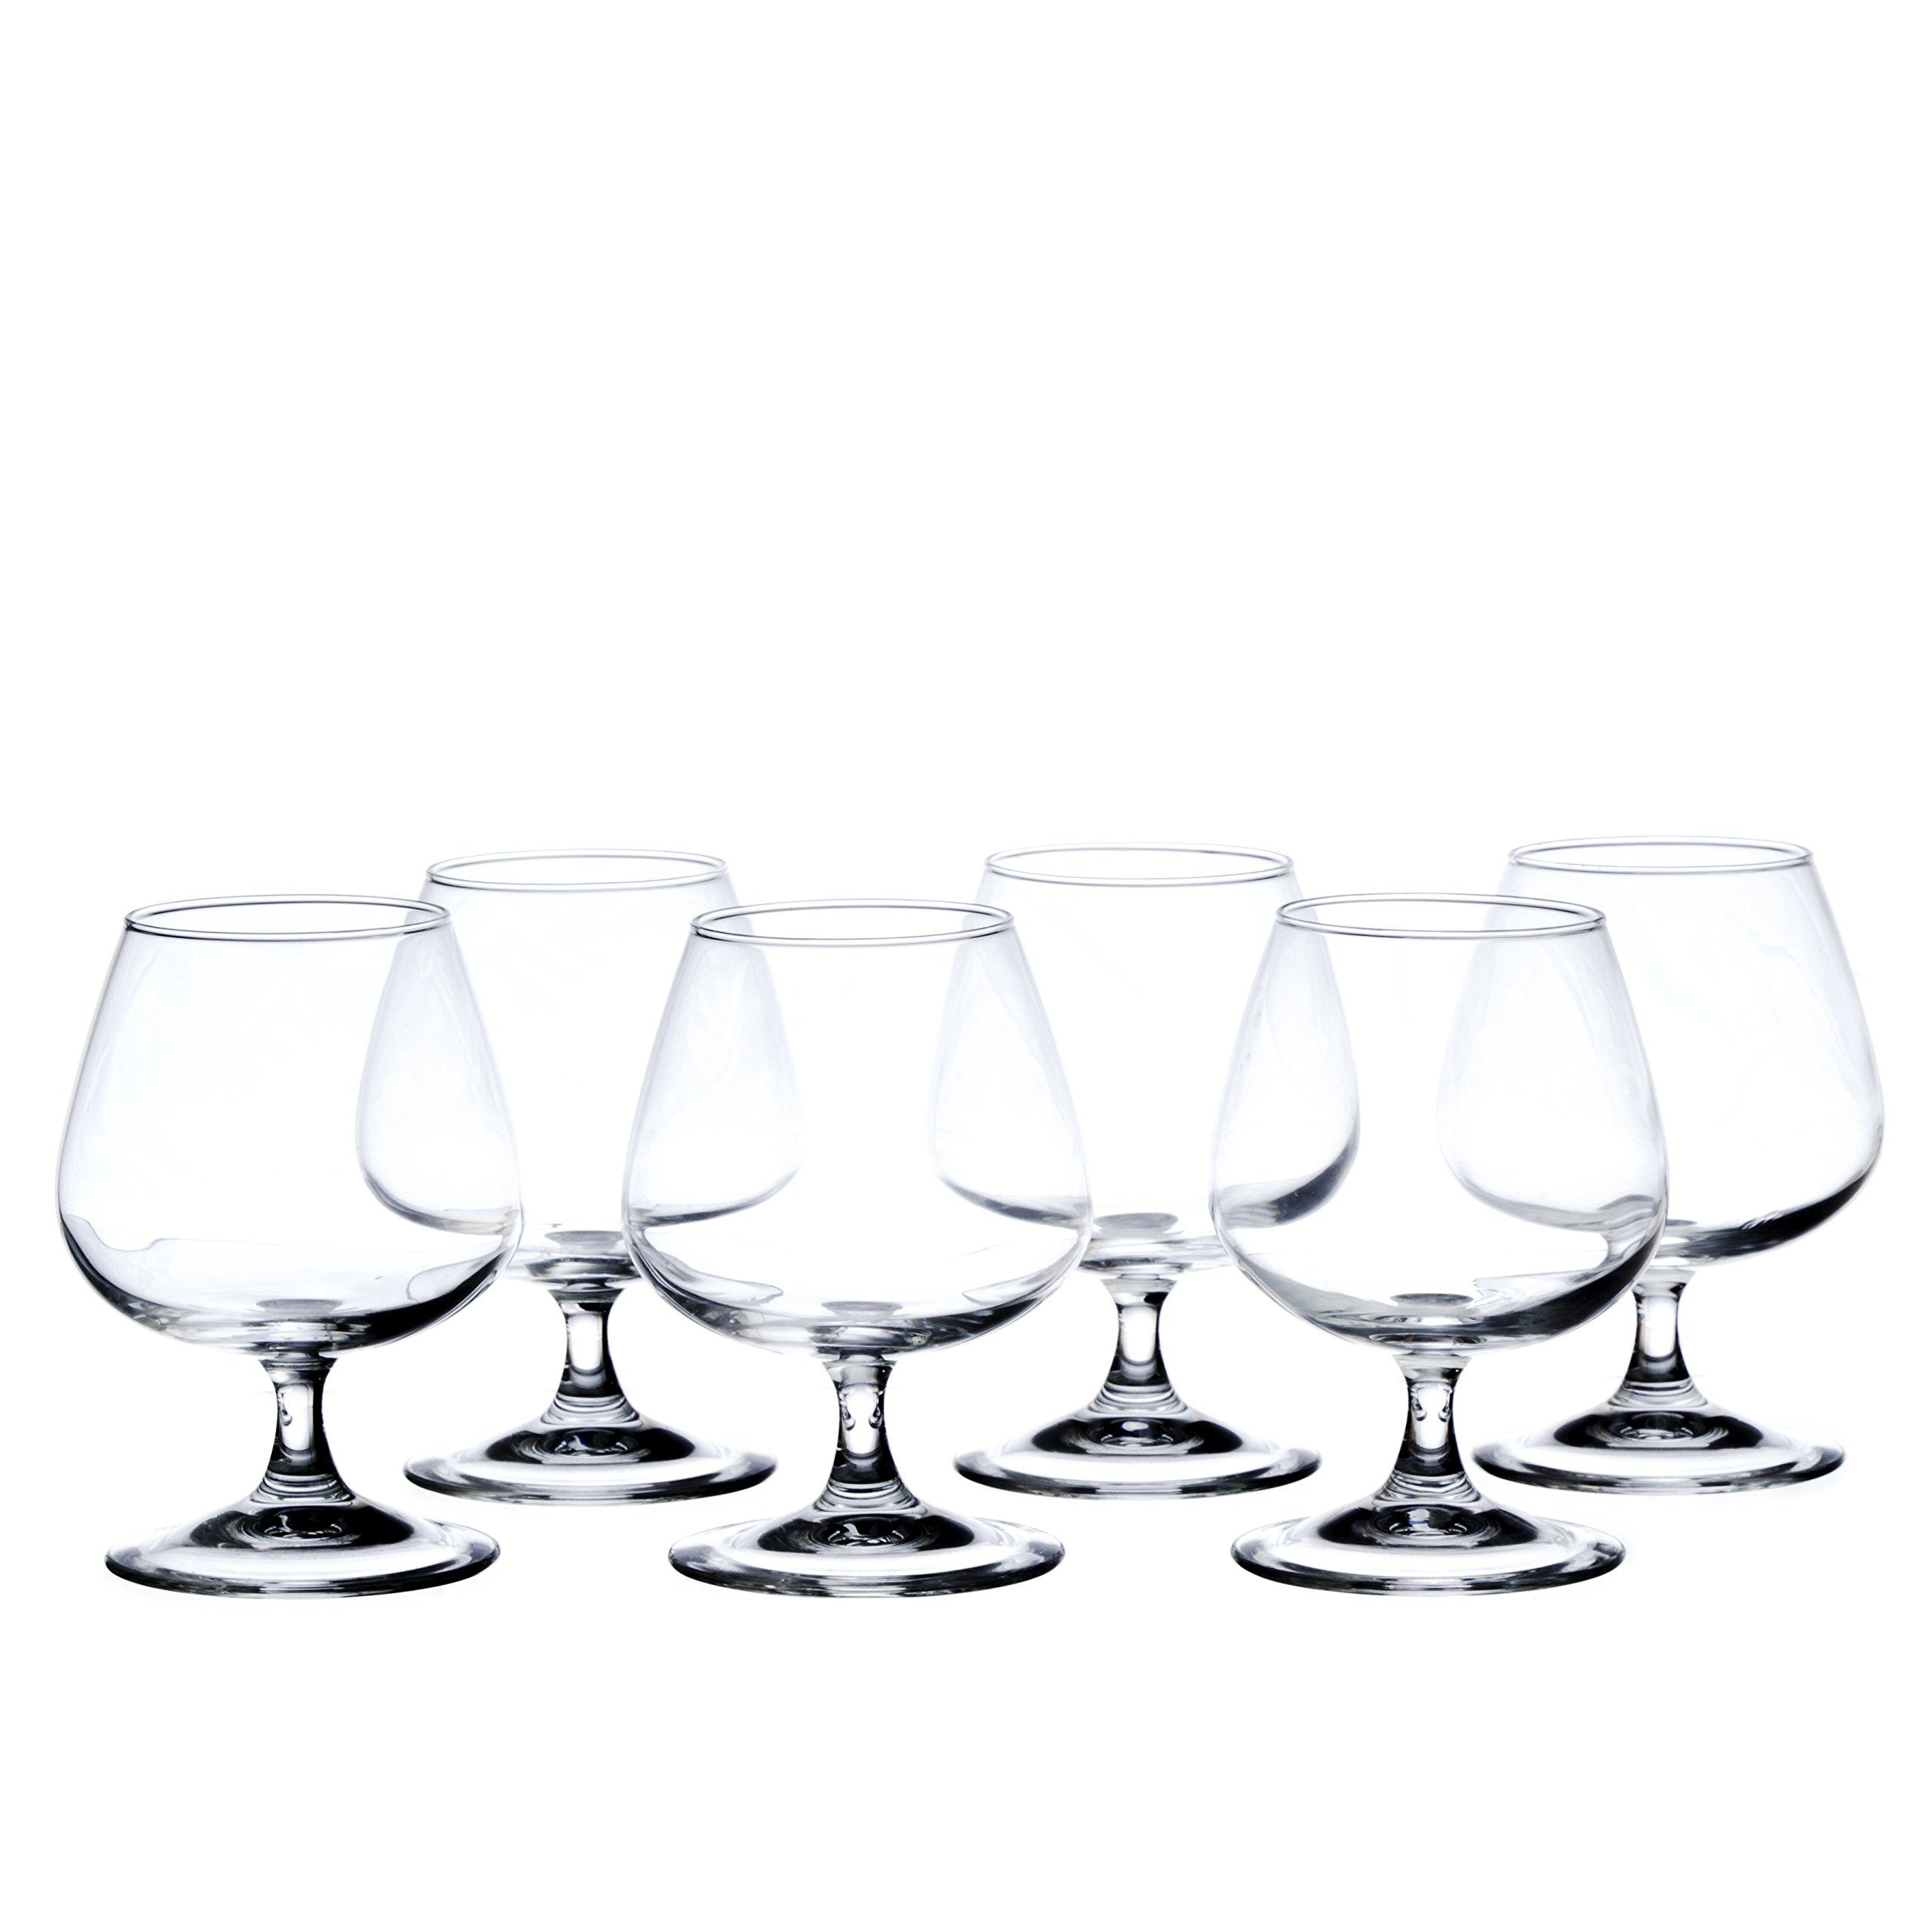 Brandy/Whiskey Glasses, t.m. ARCOROC, 14 oz. (410 ml.), 6-piece set, 12-piece set (12)